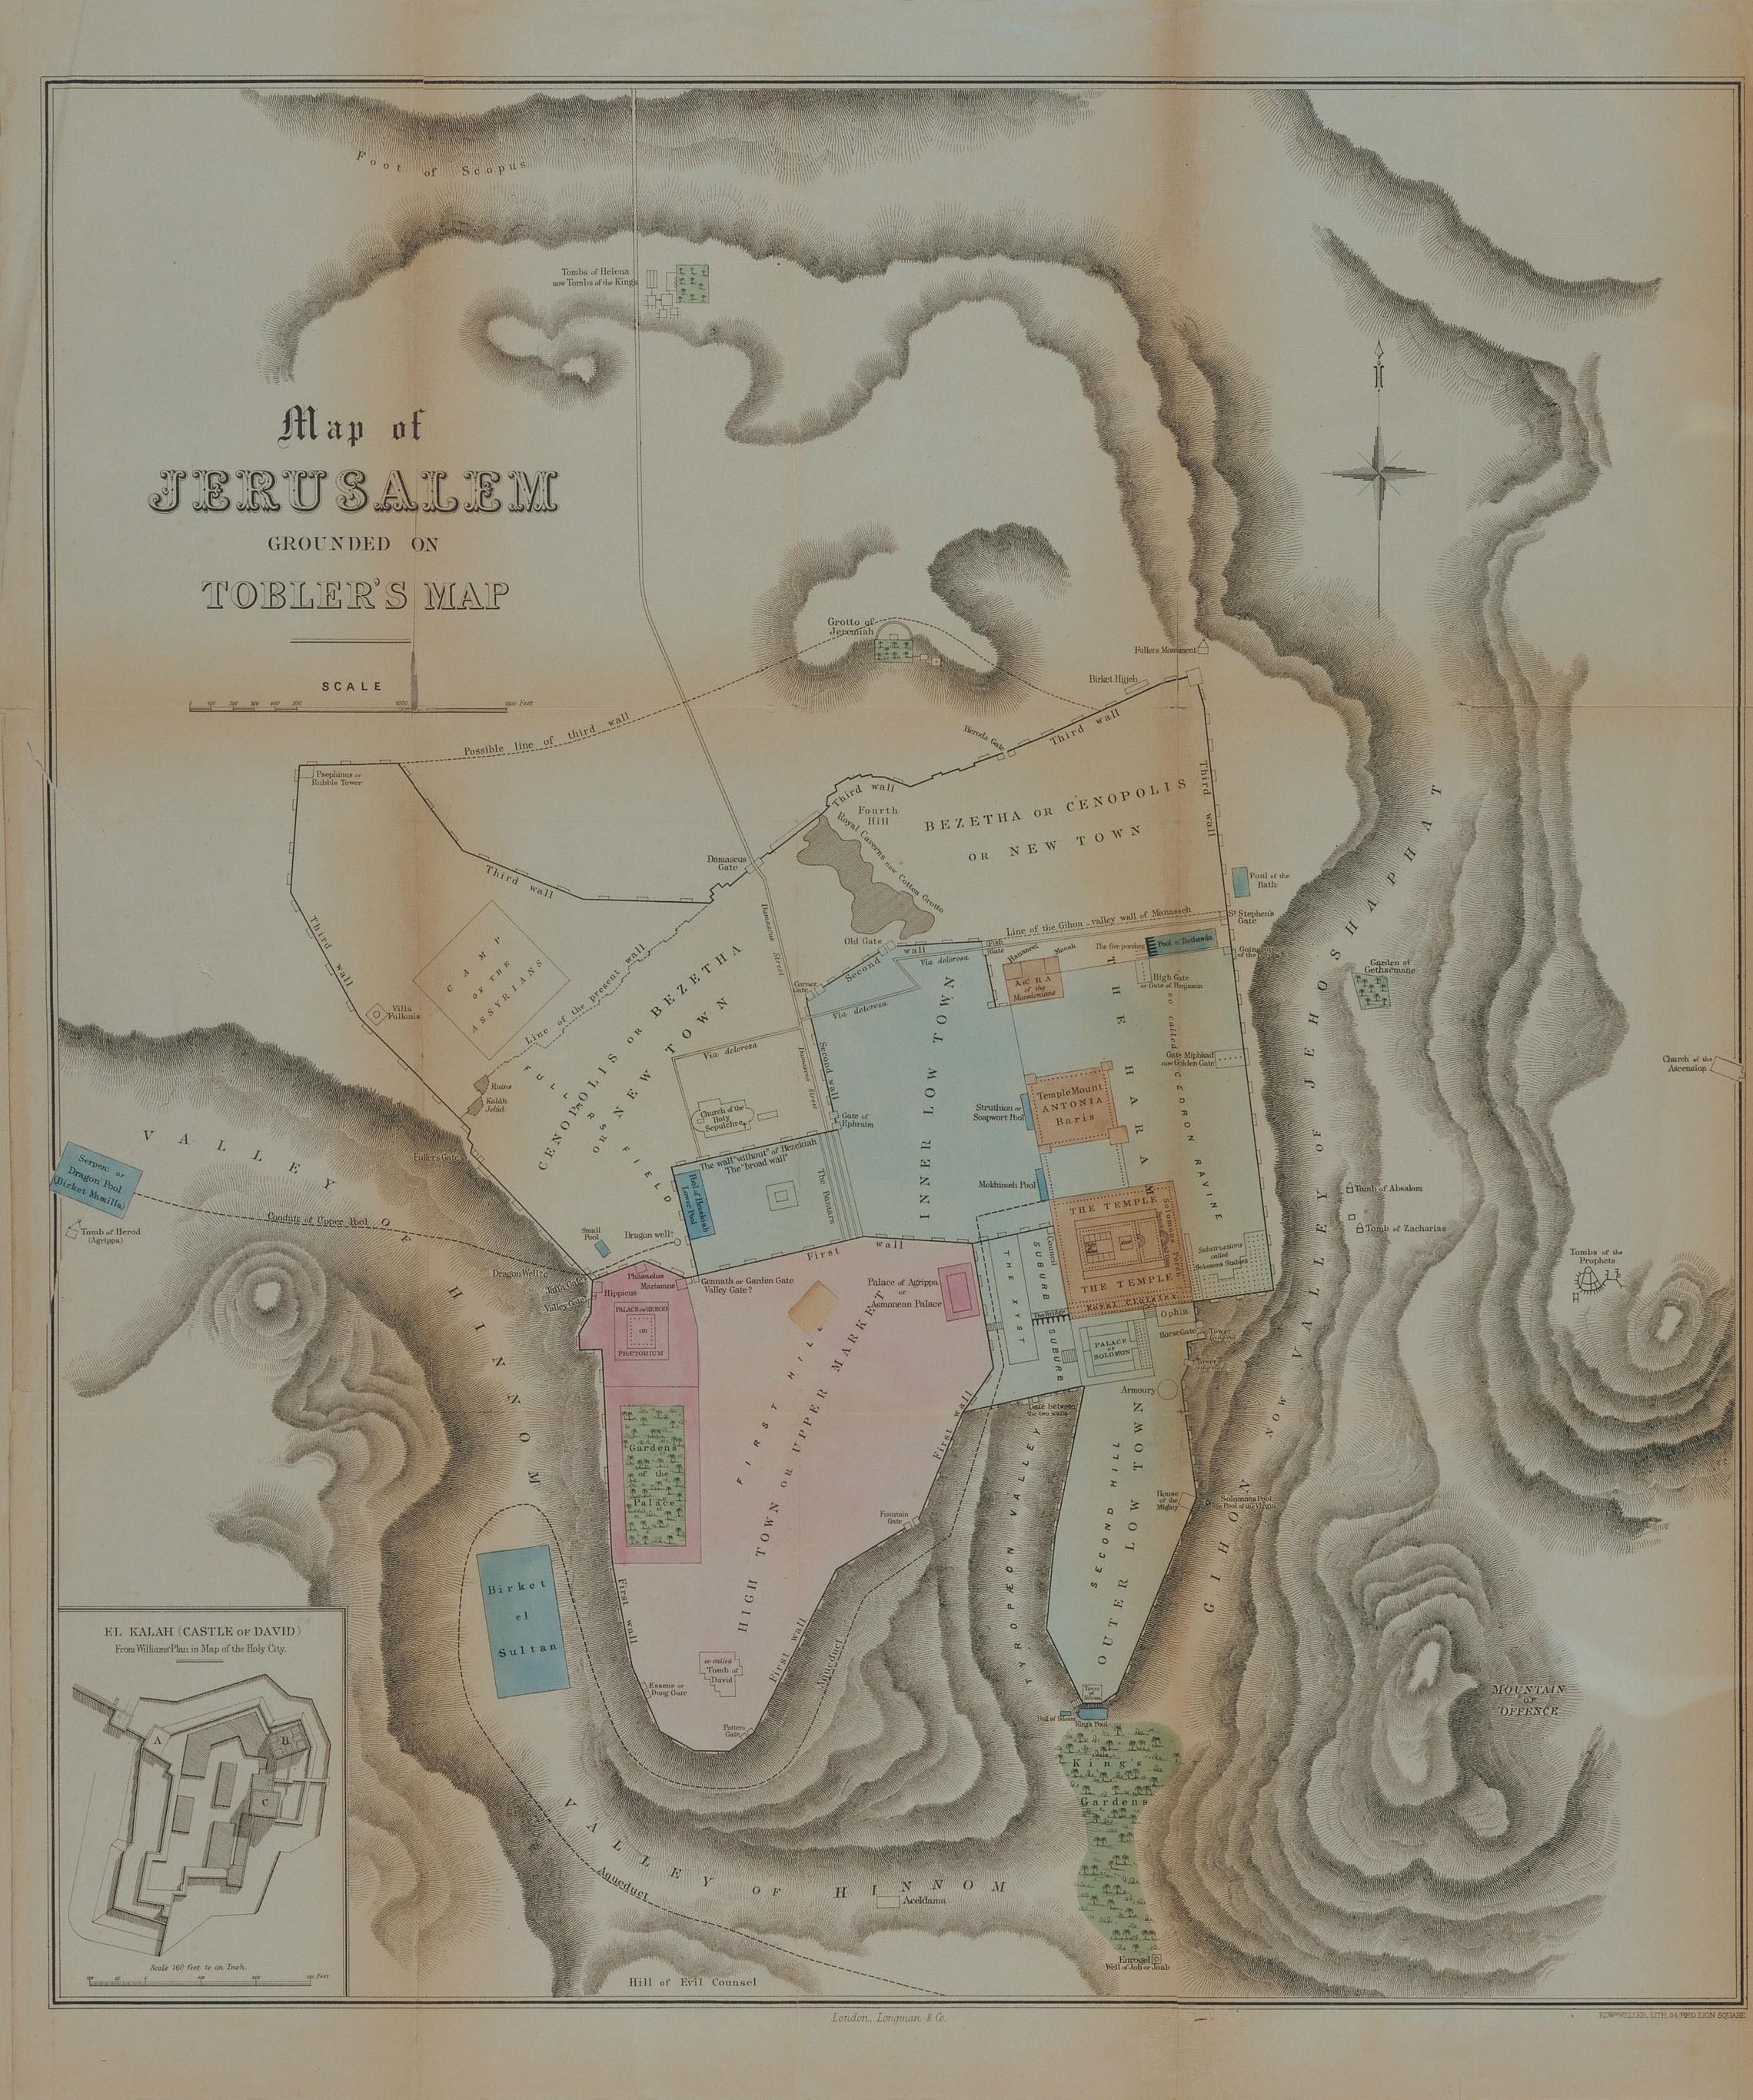 Map_of_Jerusalem-_grounded_on_Tobler's_map